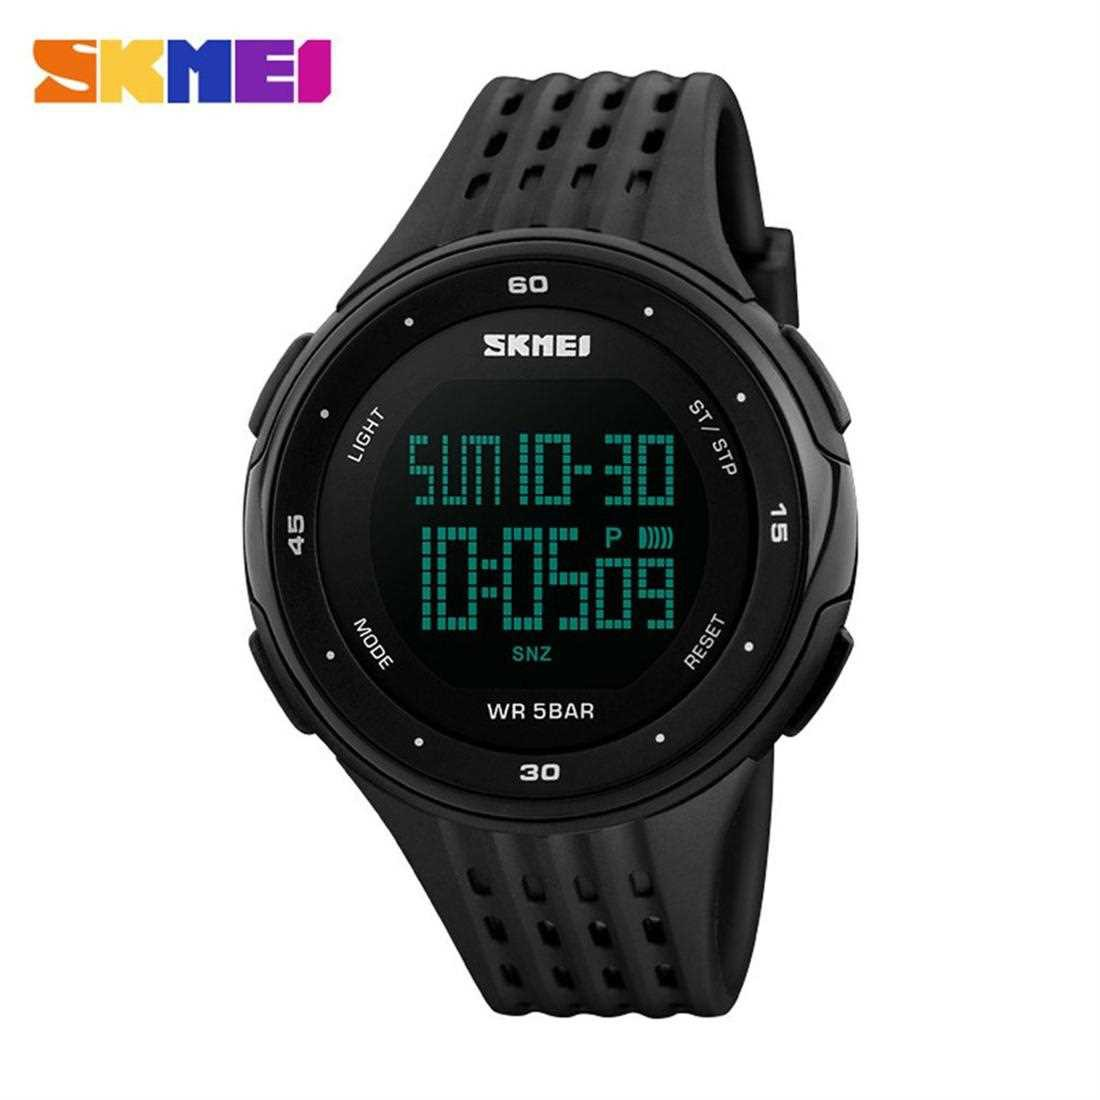 SKMEI 1219 Men Digital Wristwatch 5ATM Waterproof Outdoor Sports Chronograph (Black)